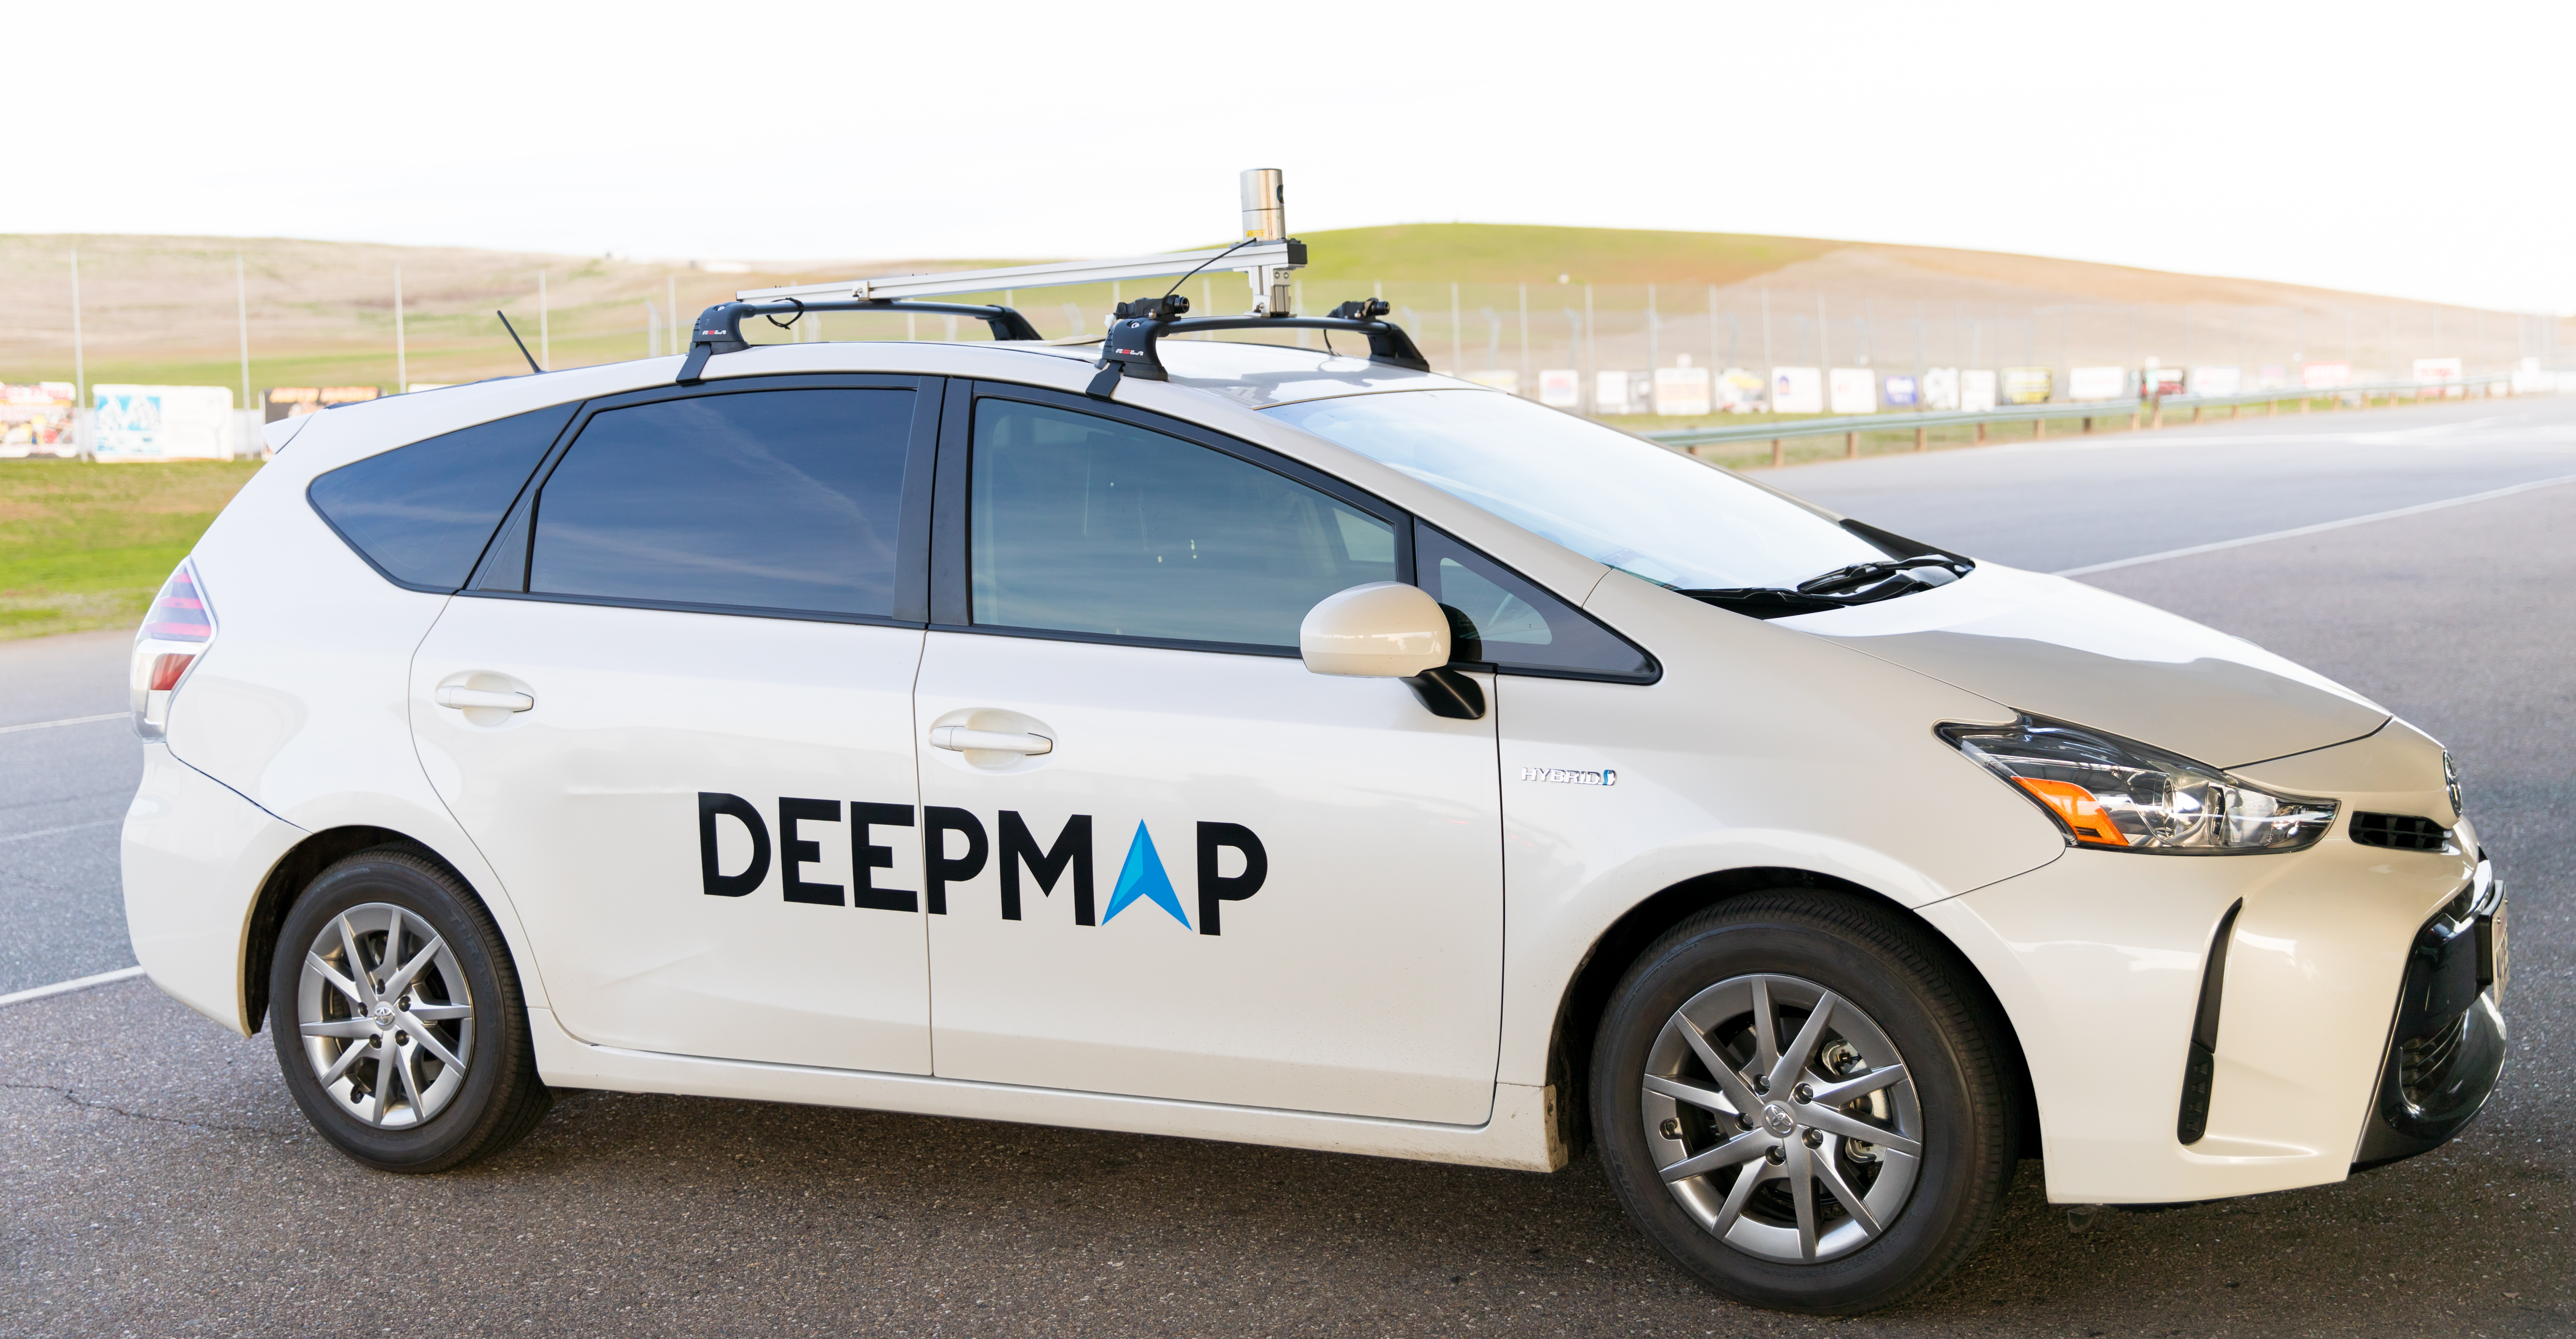 Mapovacej vozidlo od DeepMap